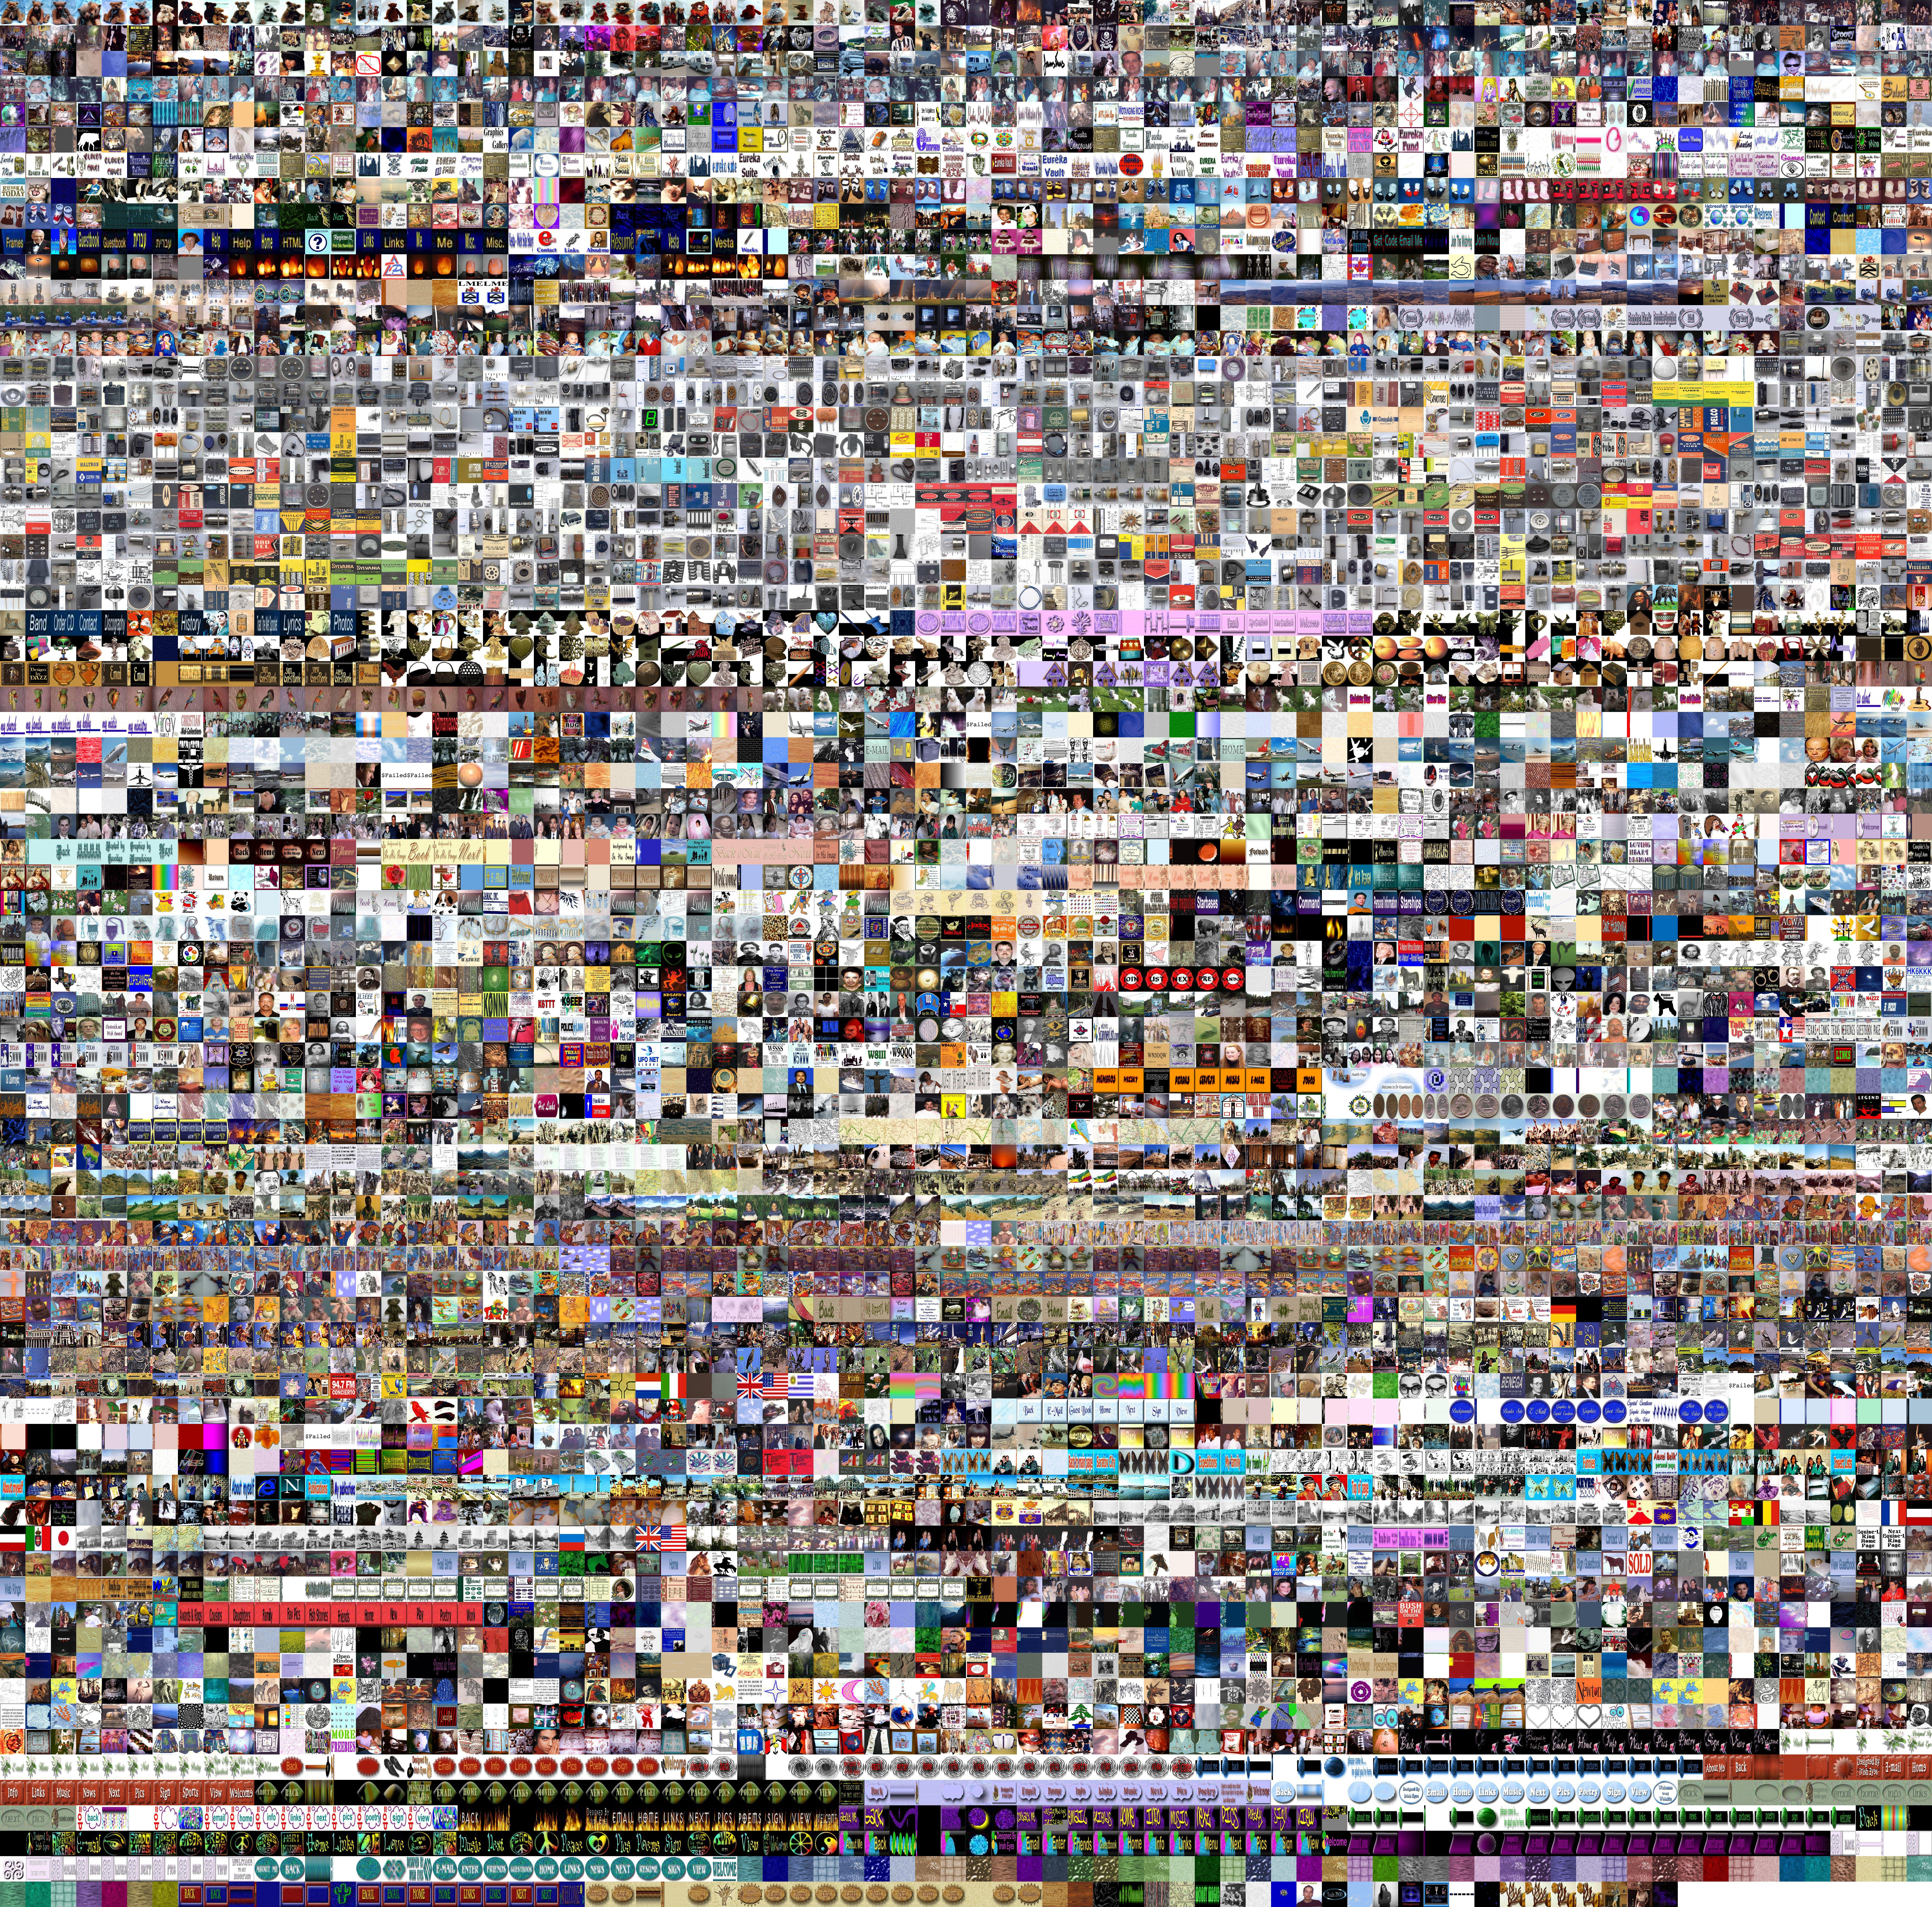 computer vision – Ian Milligan